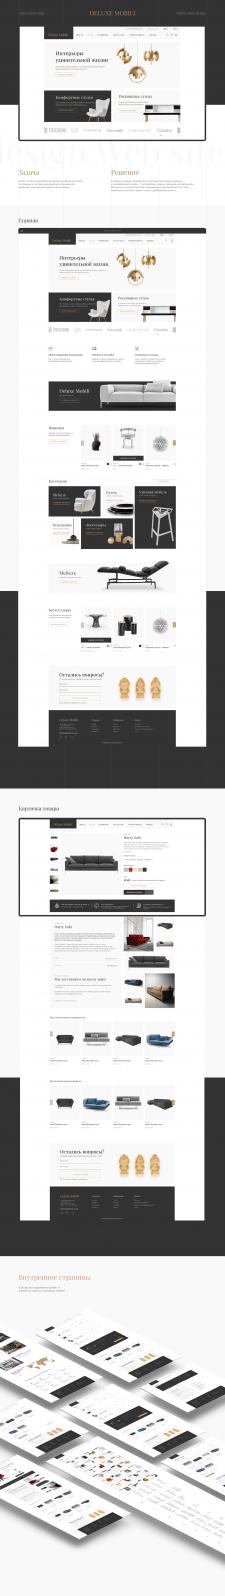 DELUXE MOBILI - дизайн интернет-магазина мебели